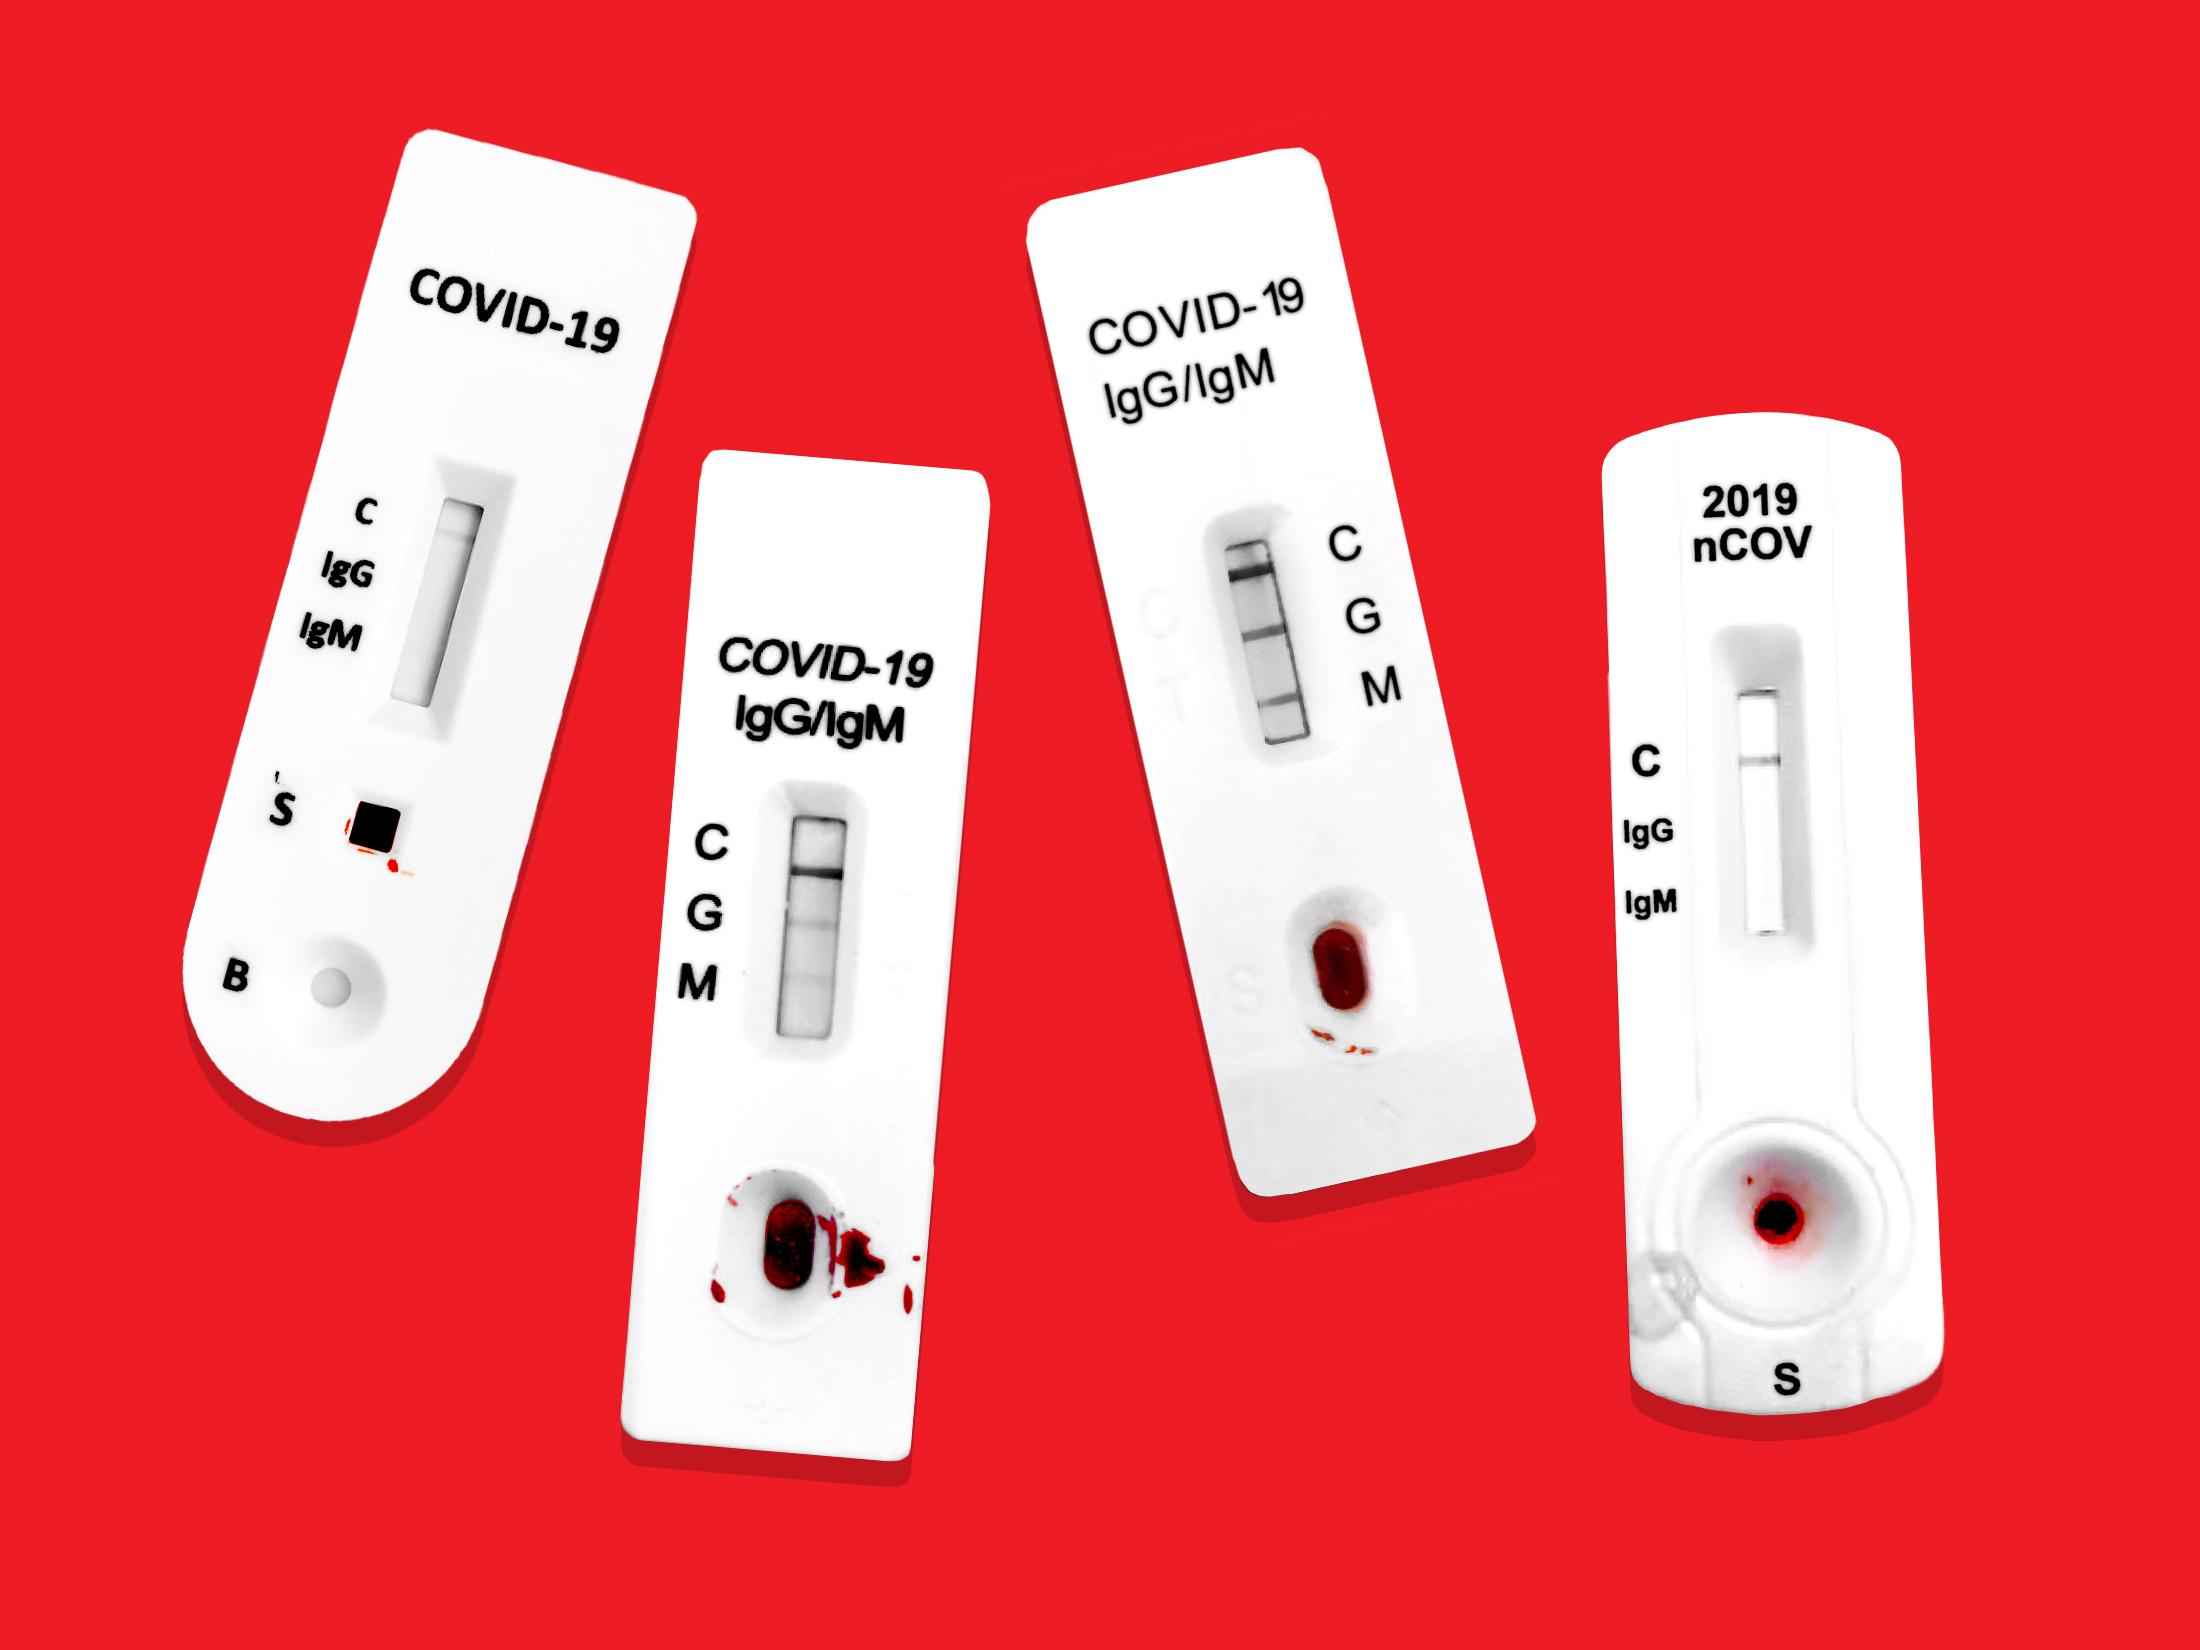 Coronavirus Antibody Tests May Produce Contradictory Results Bloomberg